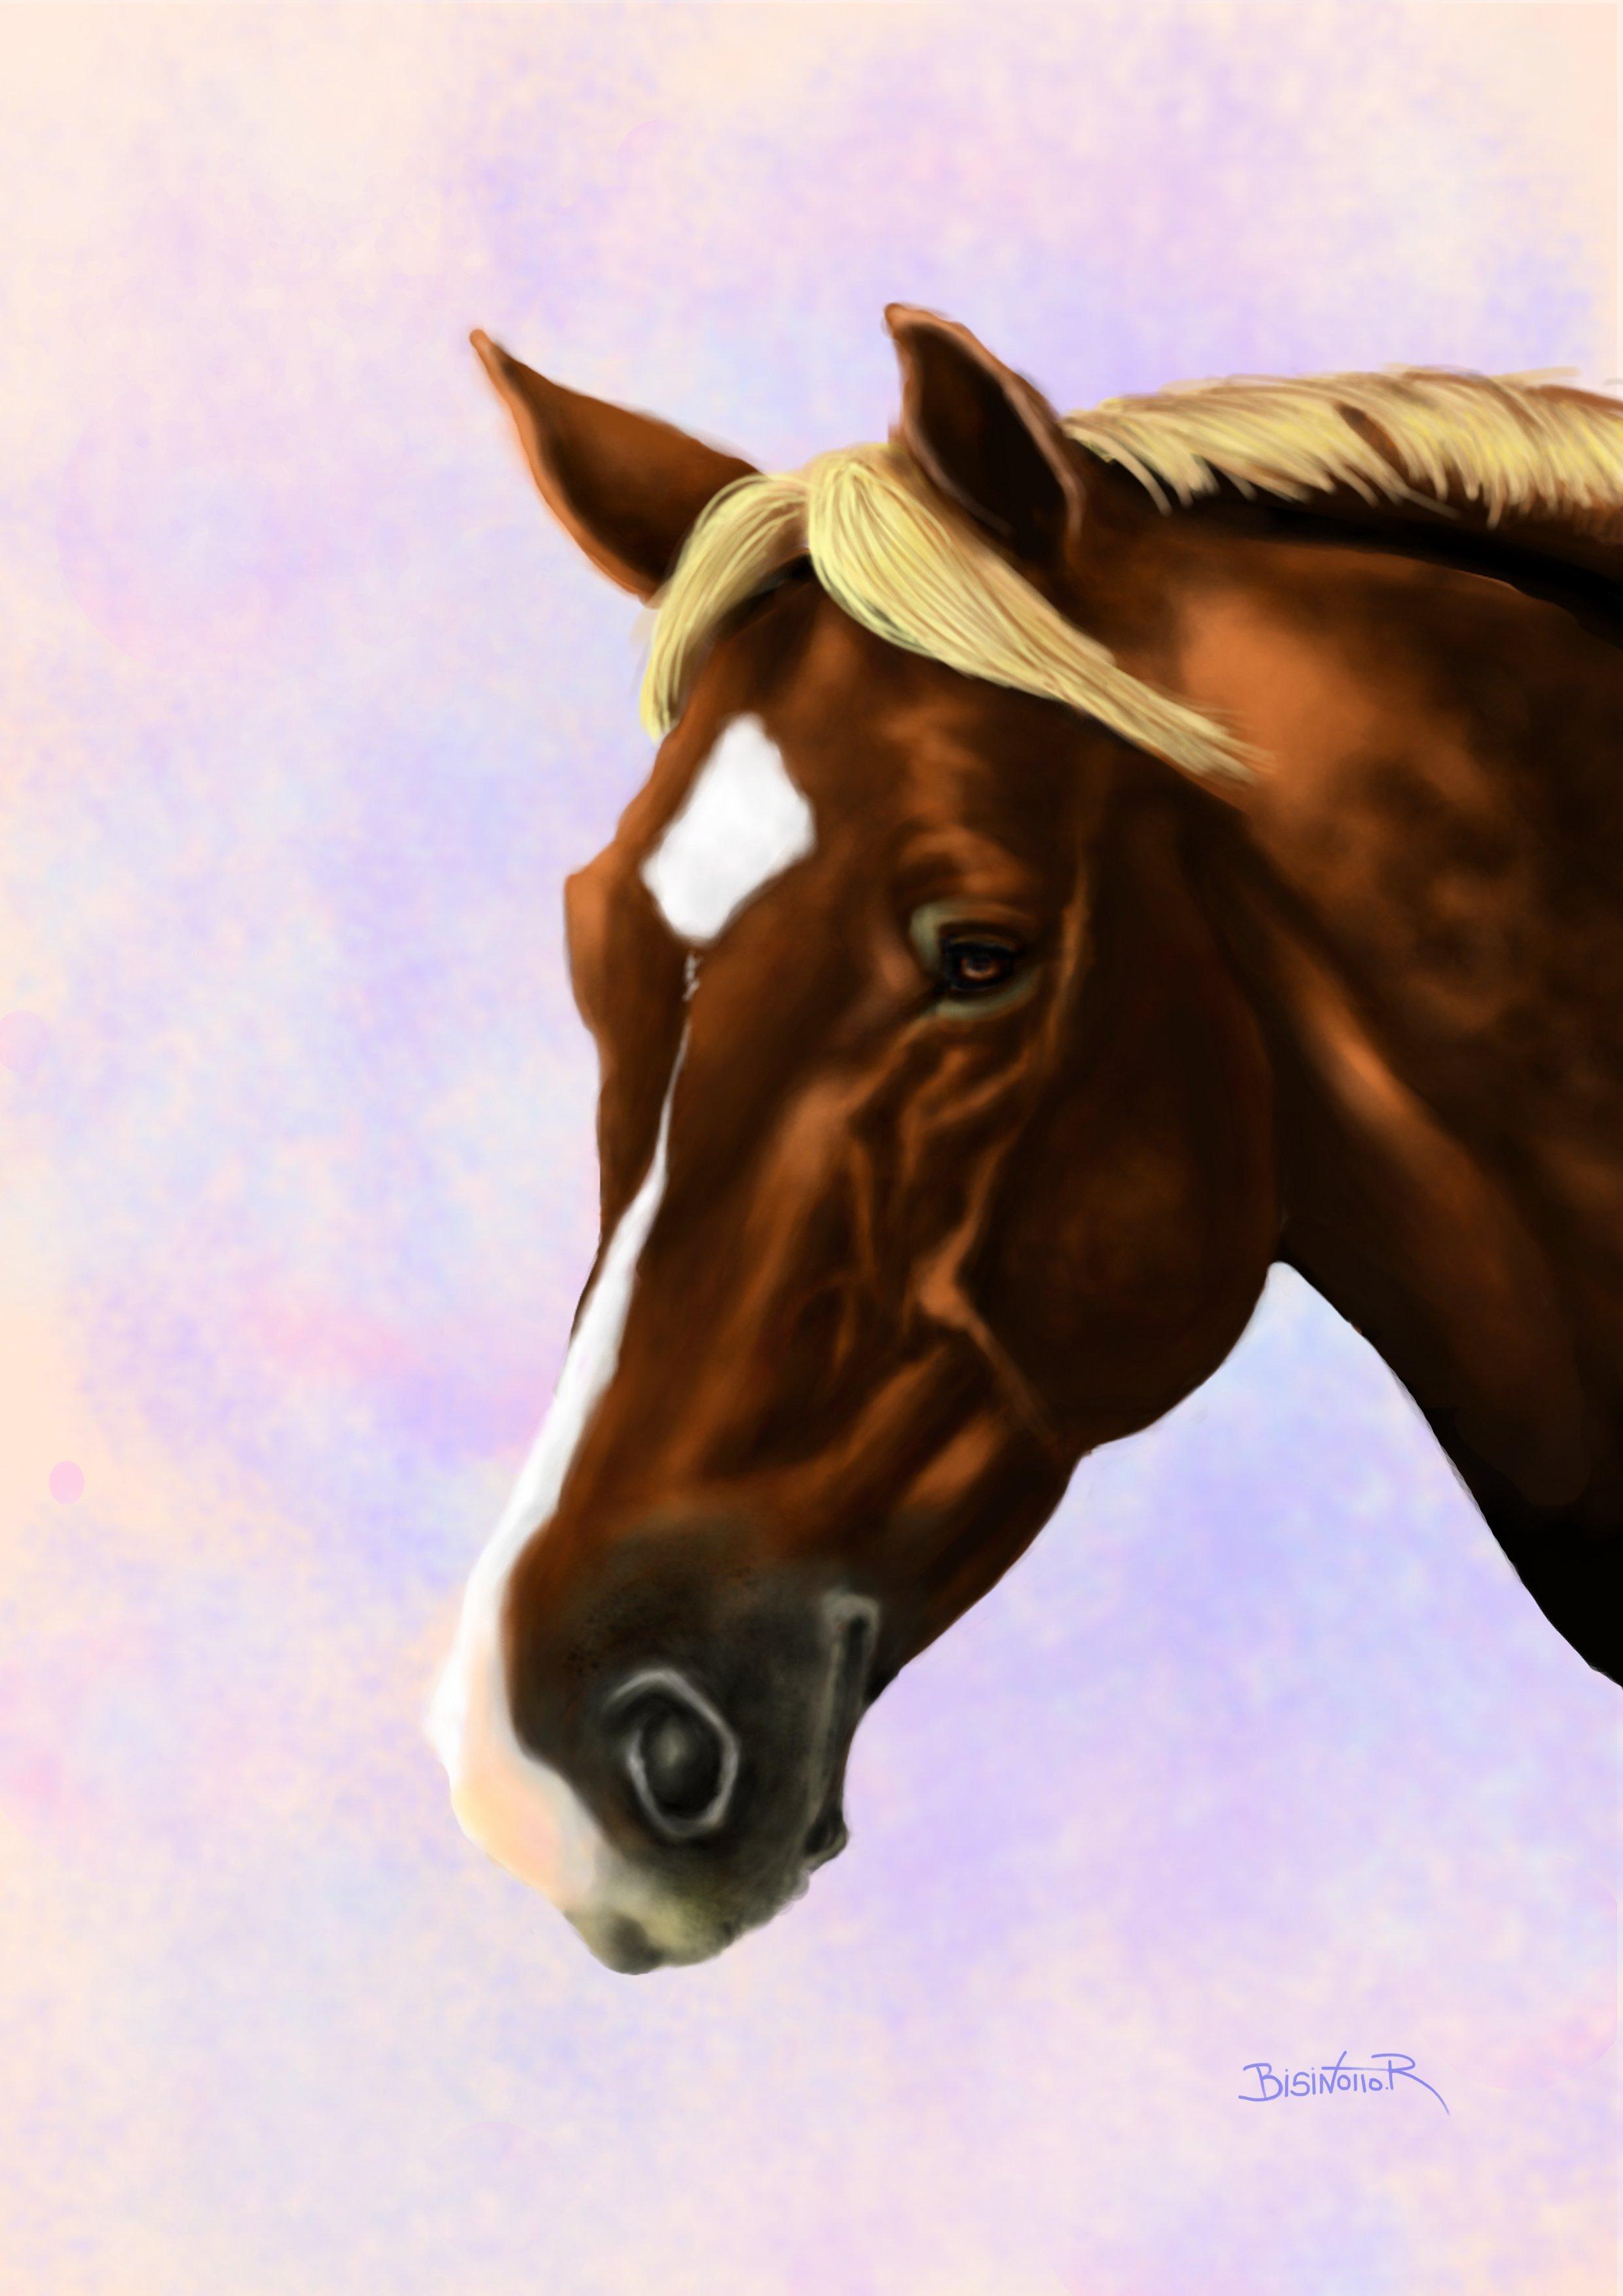 Pin dessin de chevaux peinture cheval degstubbs froblog on - Image tete de cheval ...